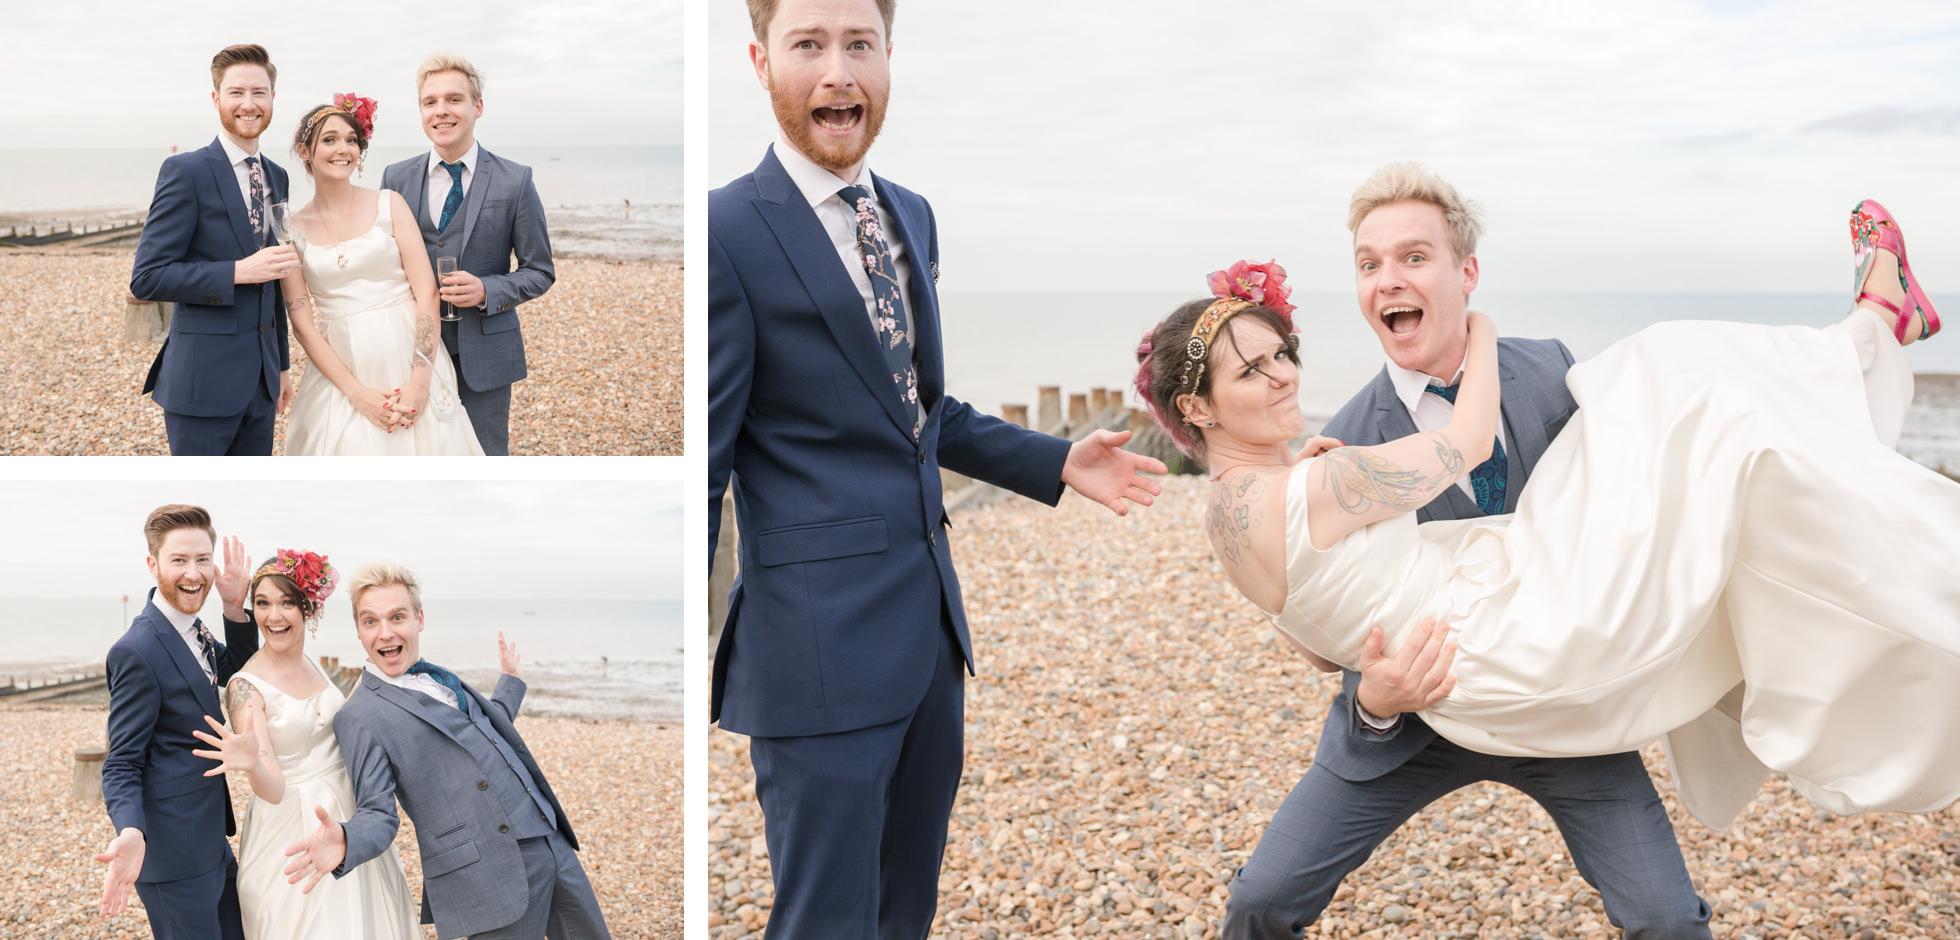 whitstable beach wedding photography